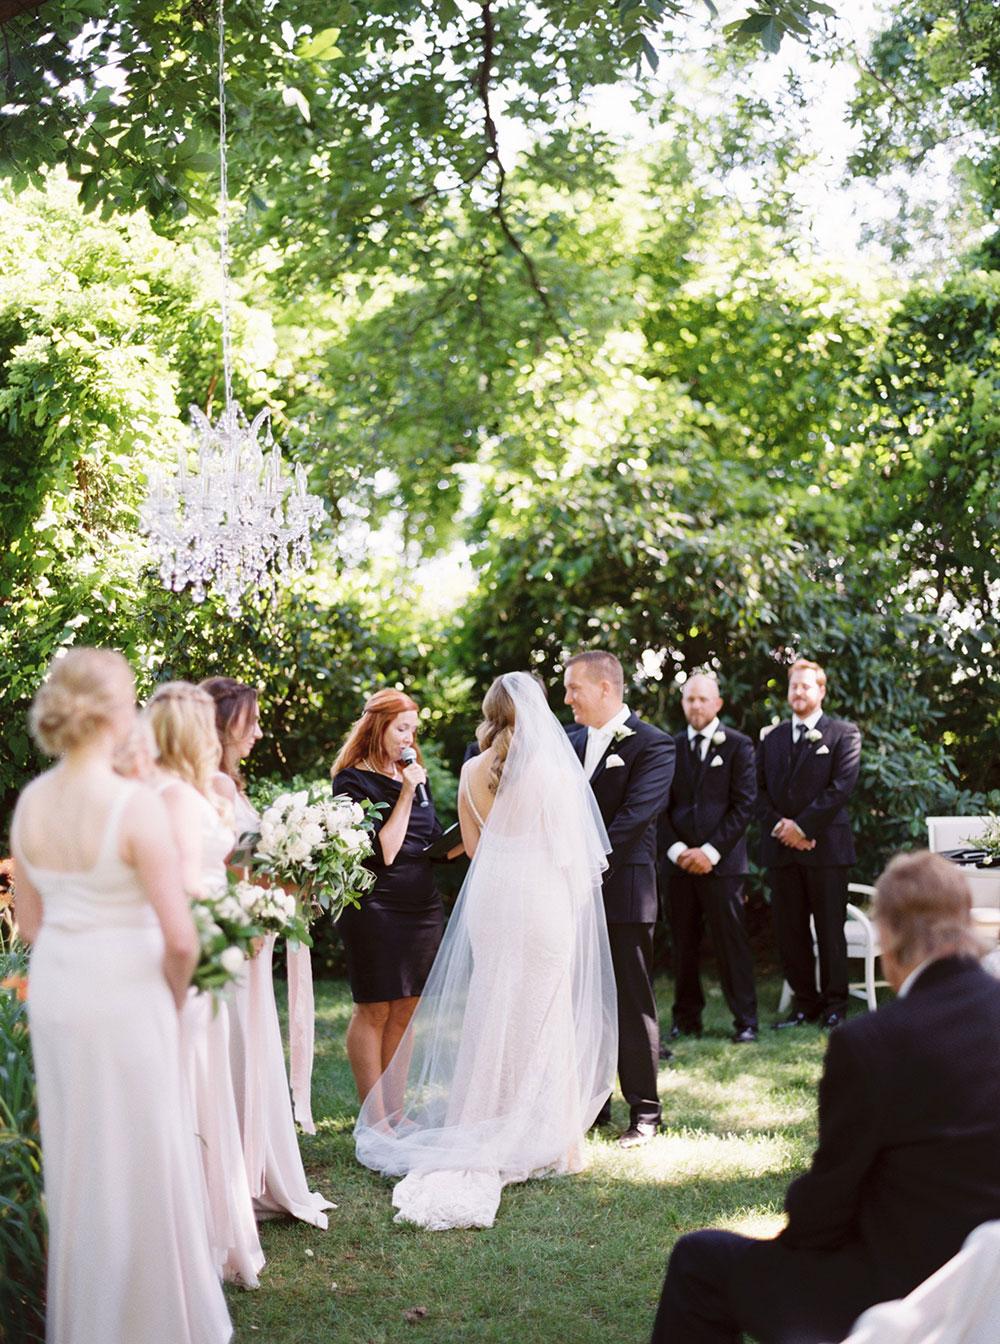 kurtz-orchards-wedding-gracewood-estate-niagara-on-the-lake-photo-by-katie-nicolle-photography-0025.JPG